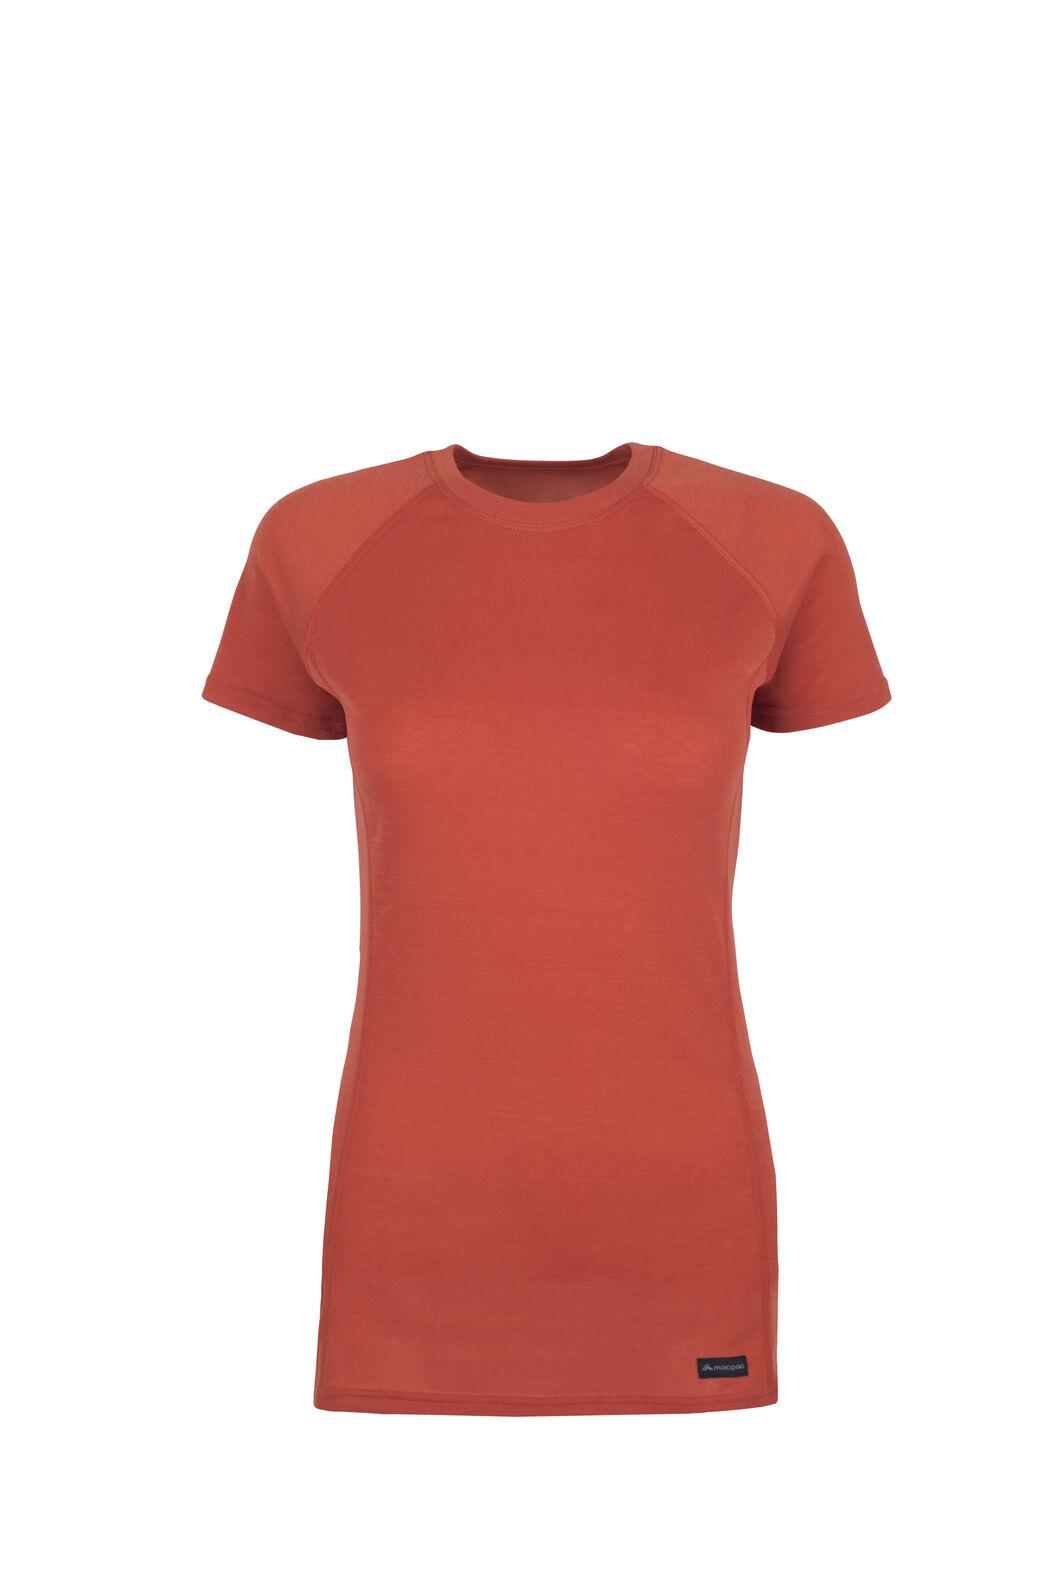 Macpac Geothermal Short Sleeve Top - Women's, Chilli, hi-res